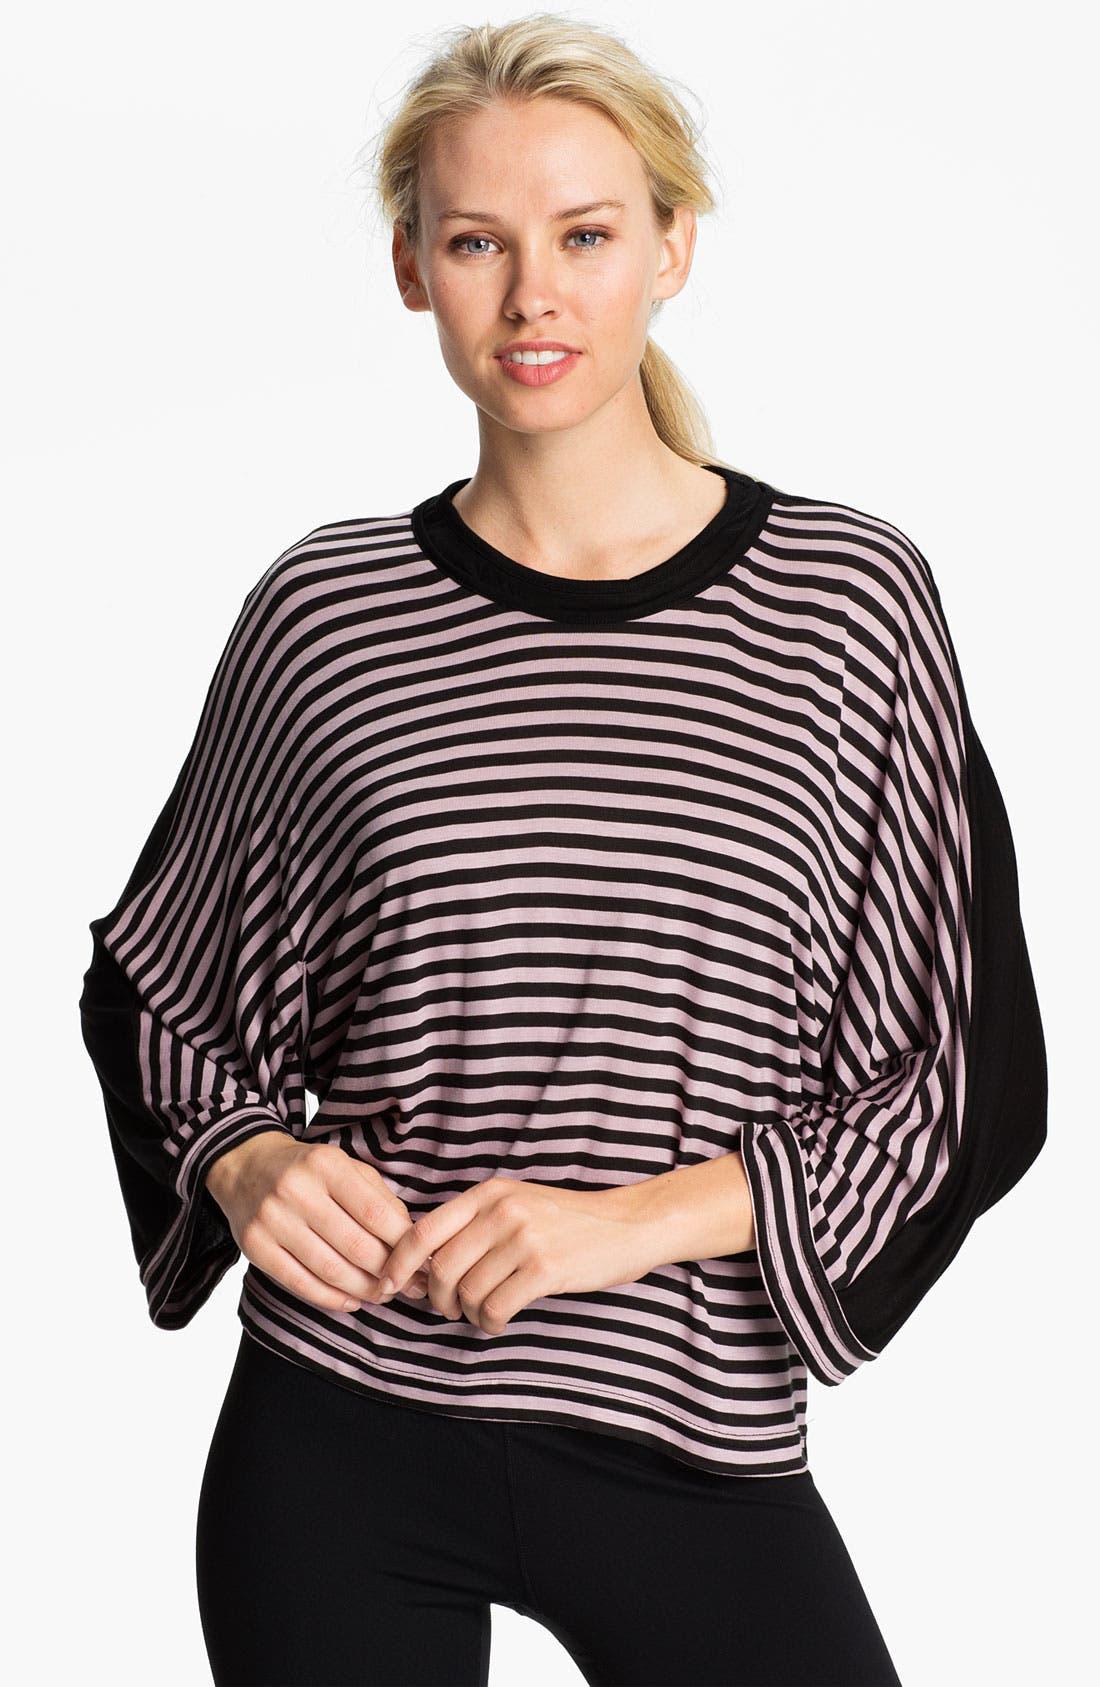 Alternate Image 1 Selected - adidas by Stella McCartney 'Yoga' Stripe Tee